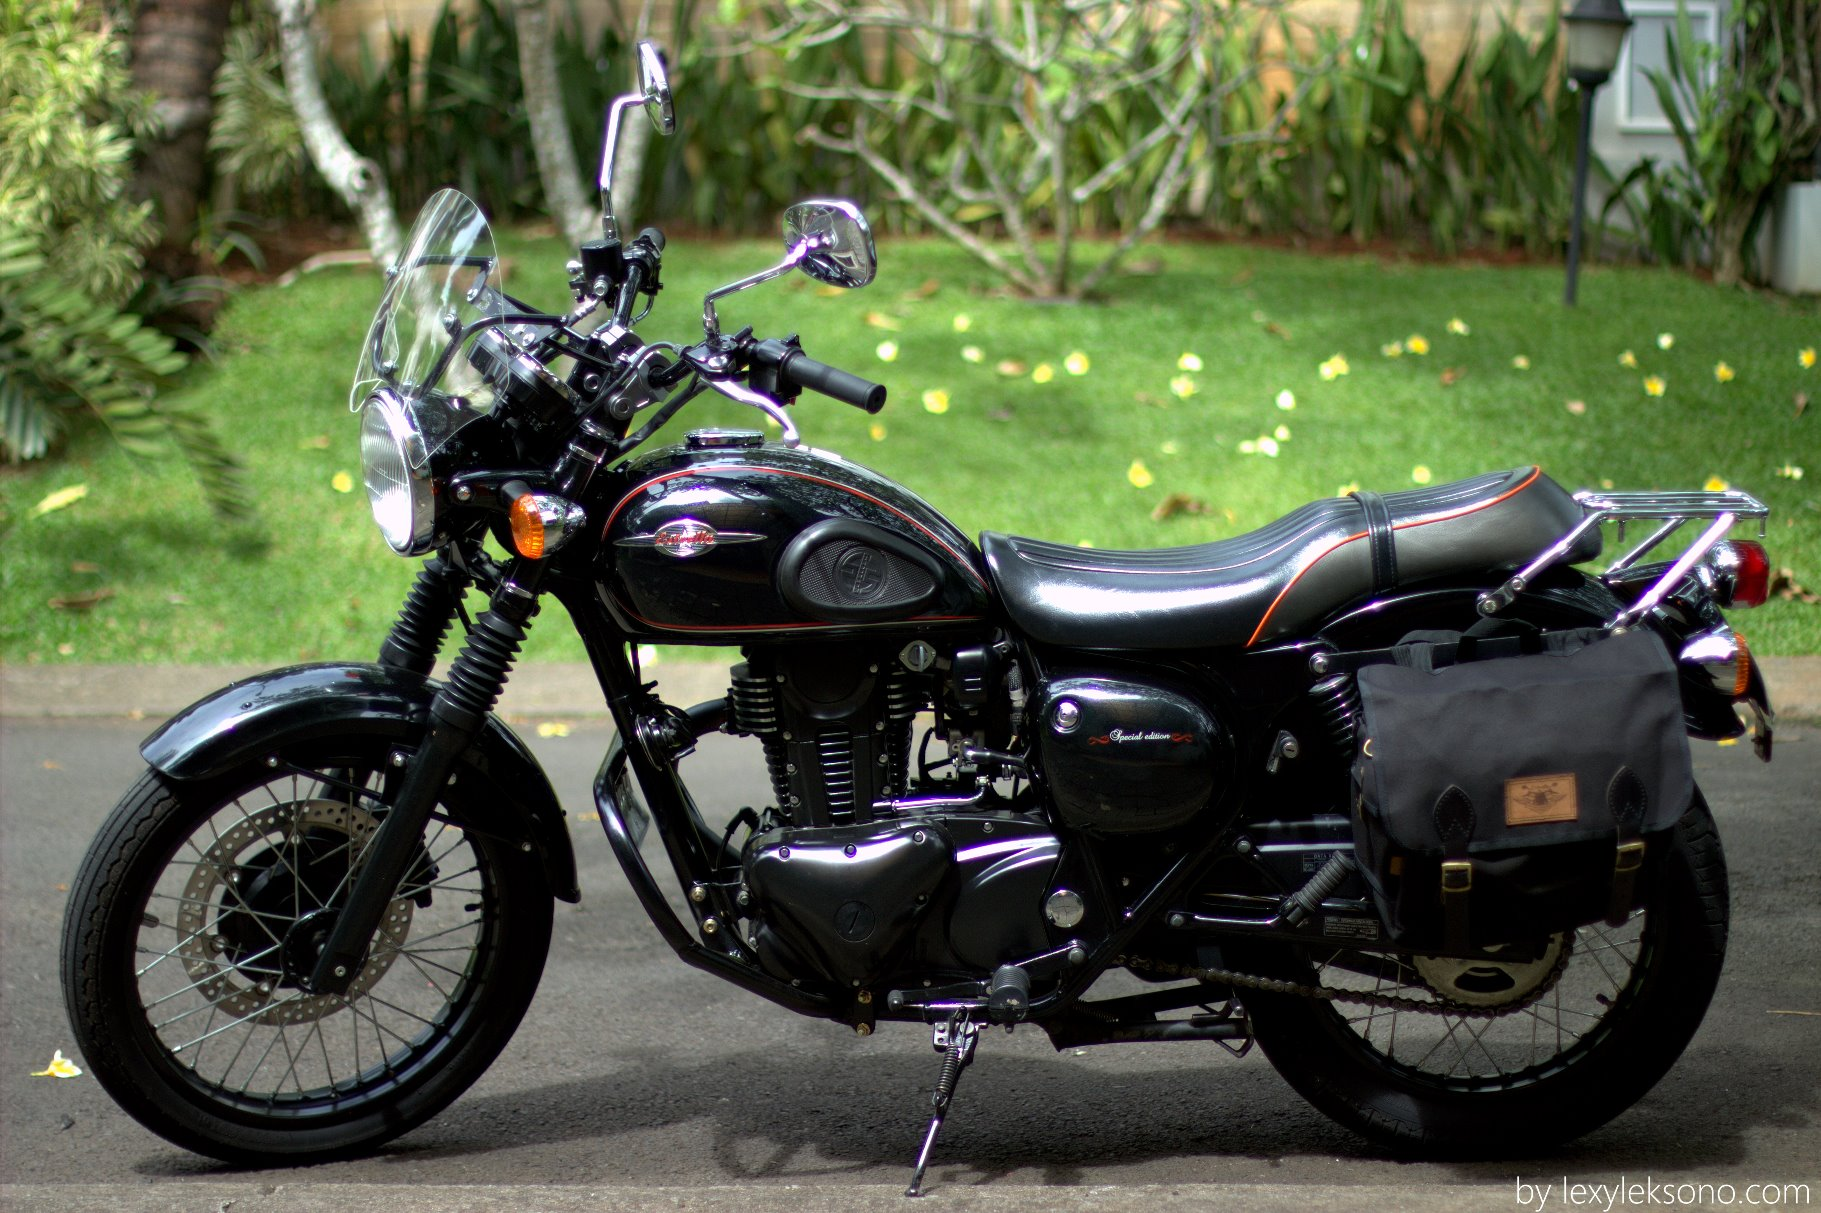 60 Modifikasi Motor Kawasaki Estrella 250 Terbaik Dan Terupdate